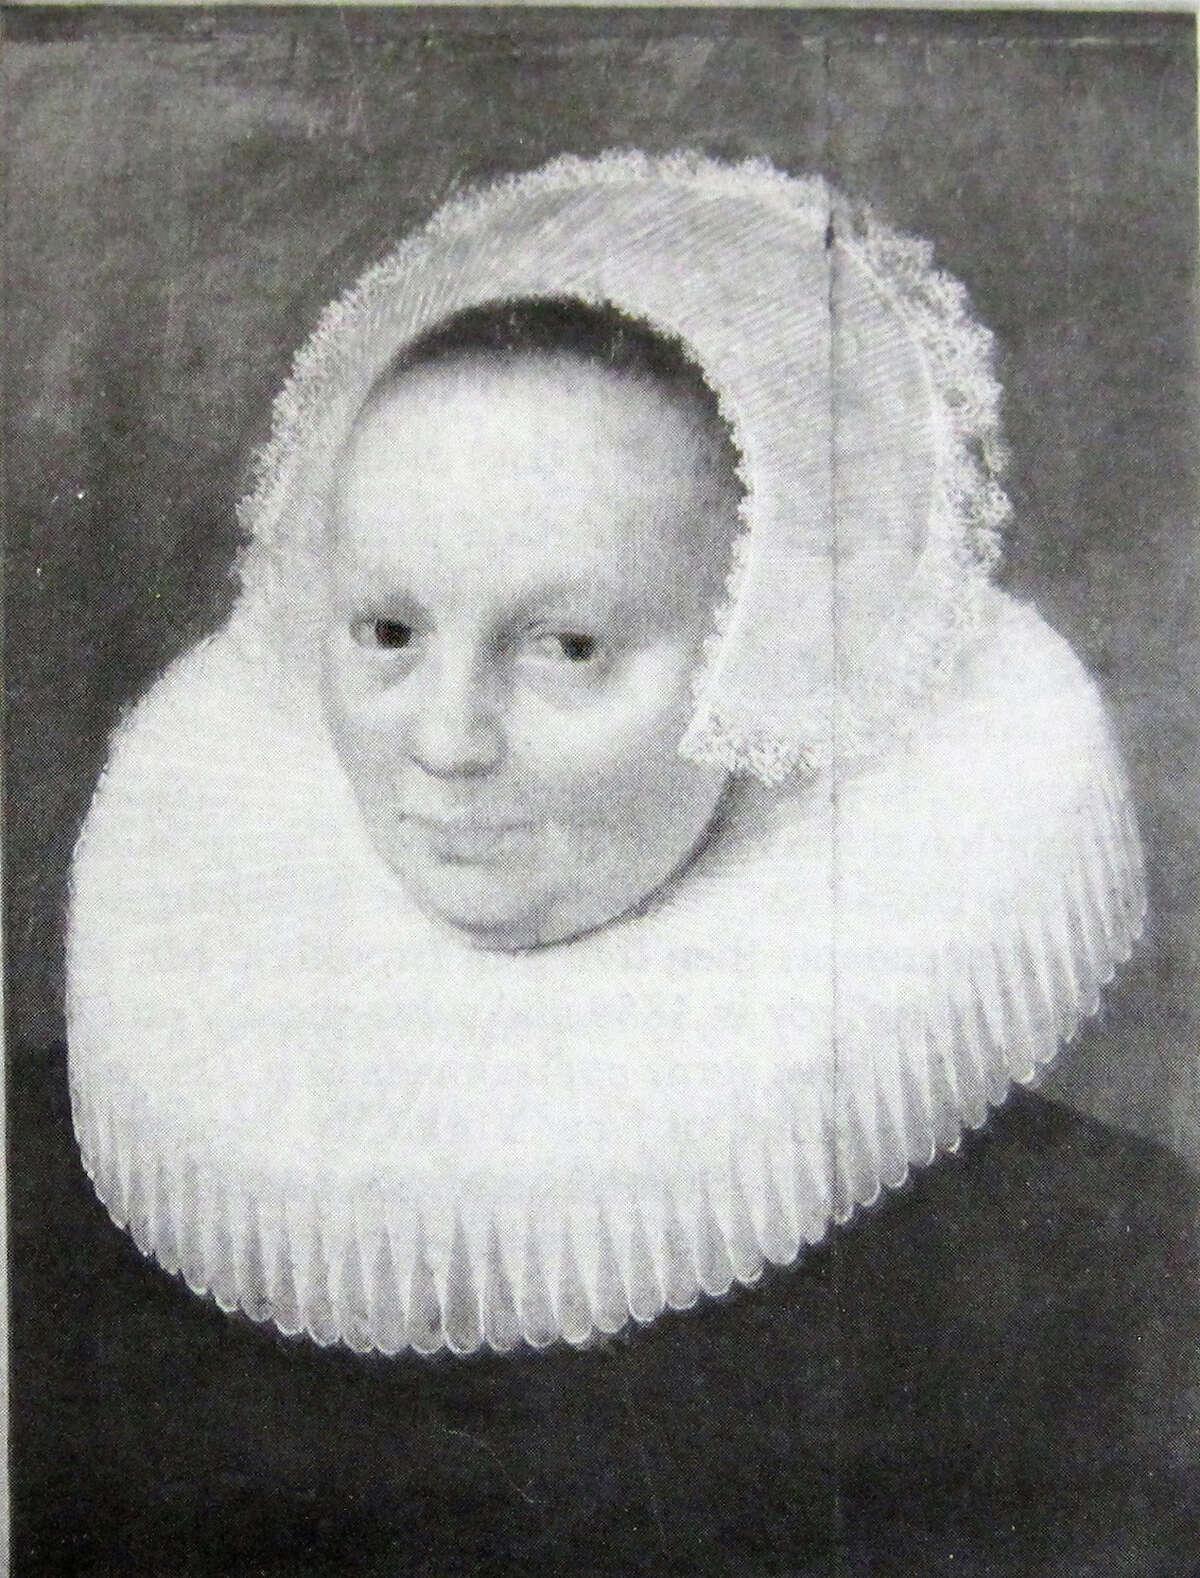 Portrait believed to be Anneke Jans Bogardus.